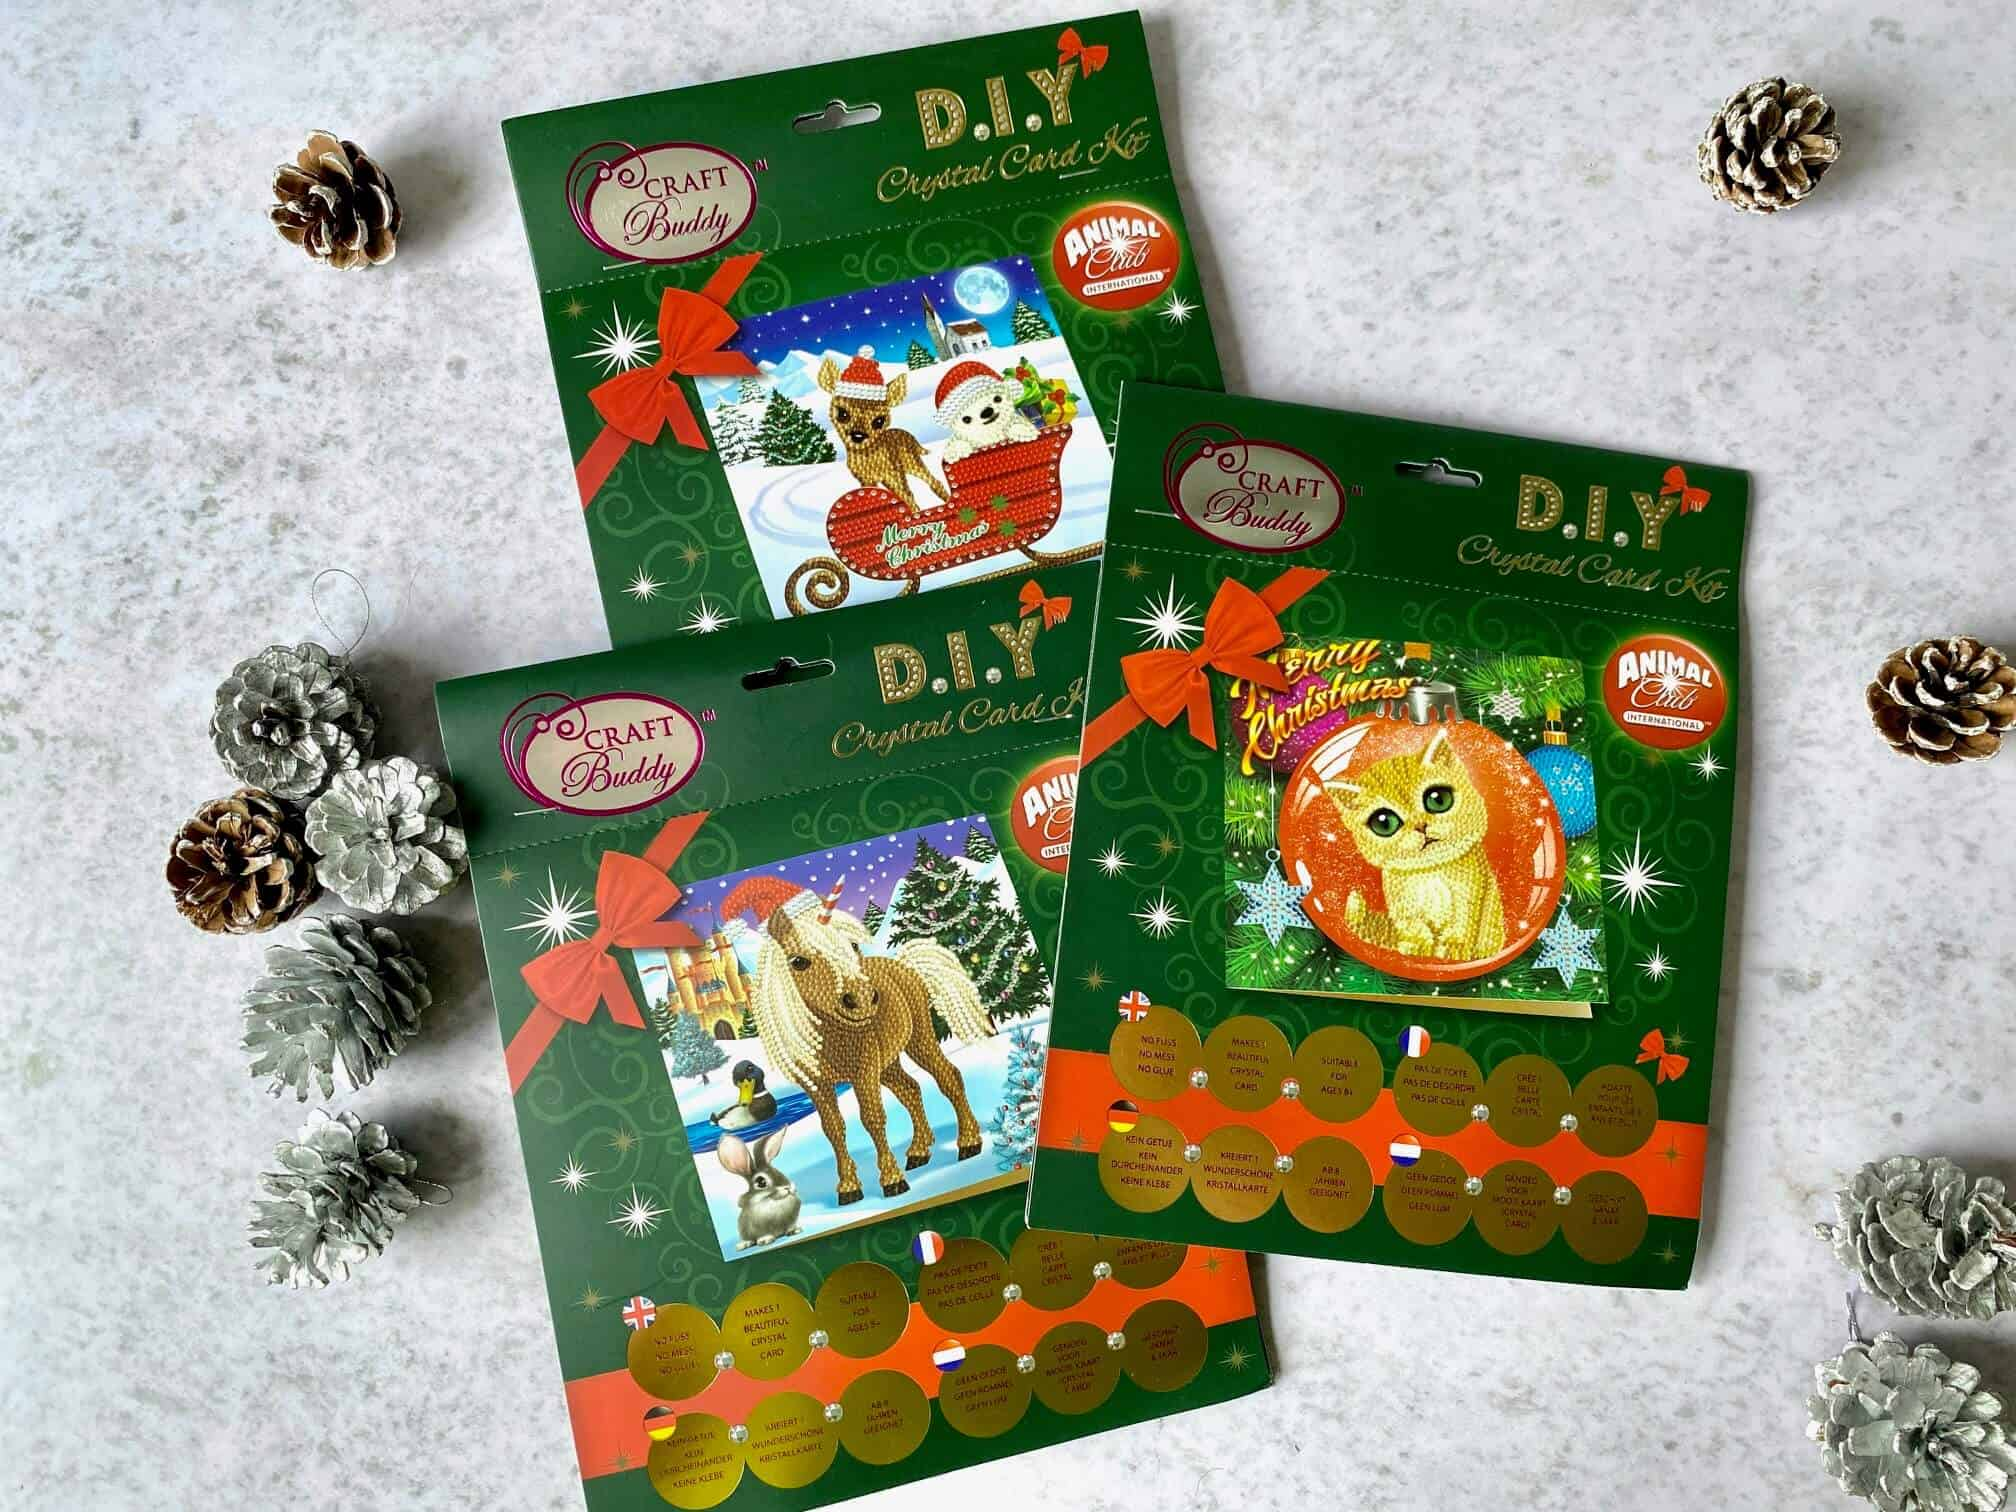 3 DIY Crystal Card Kits from Craft Buddy